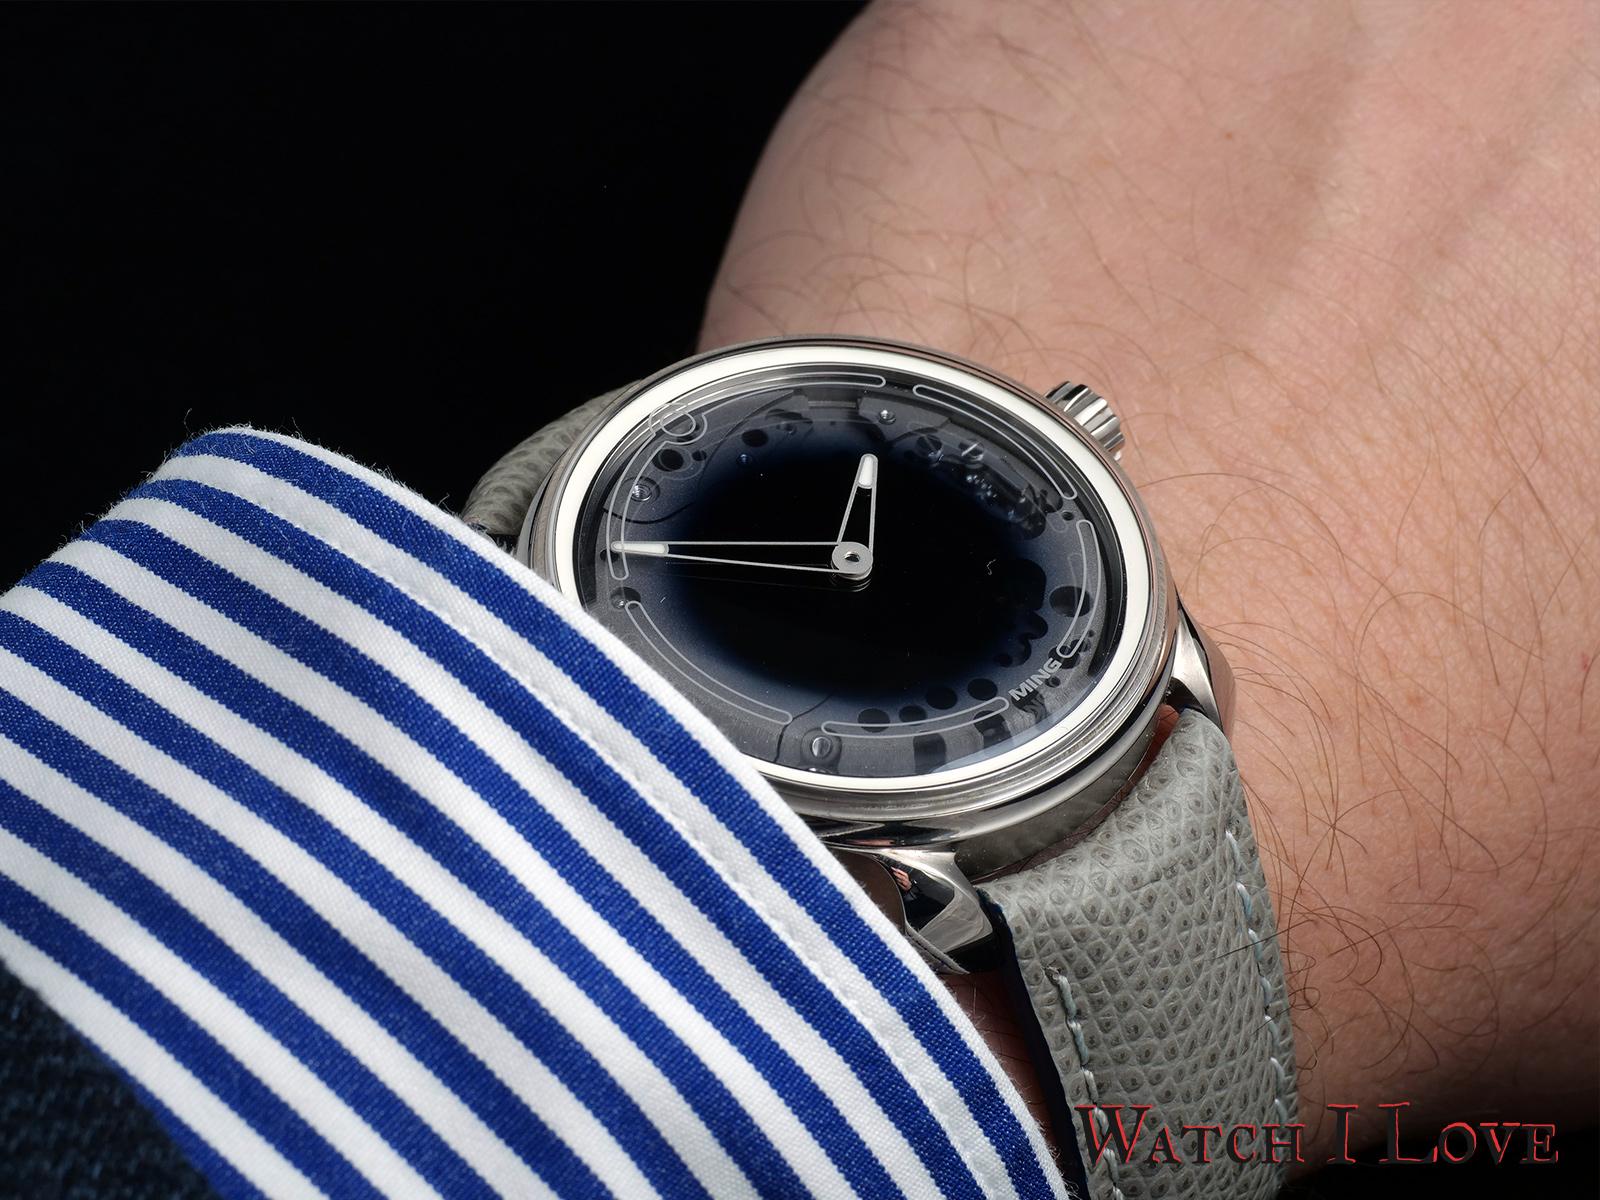 MING-19.01 on the wrist